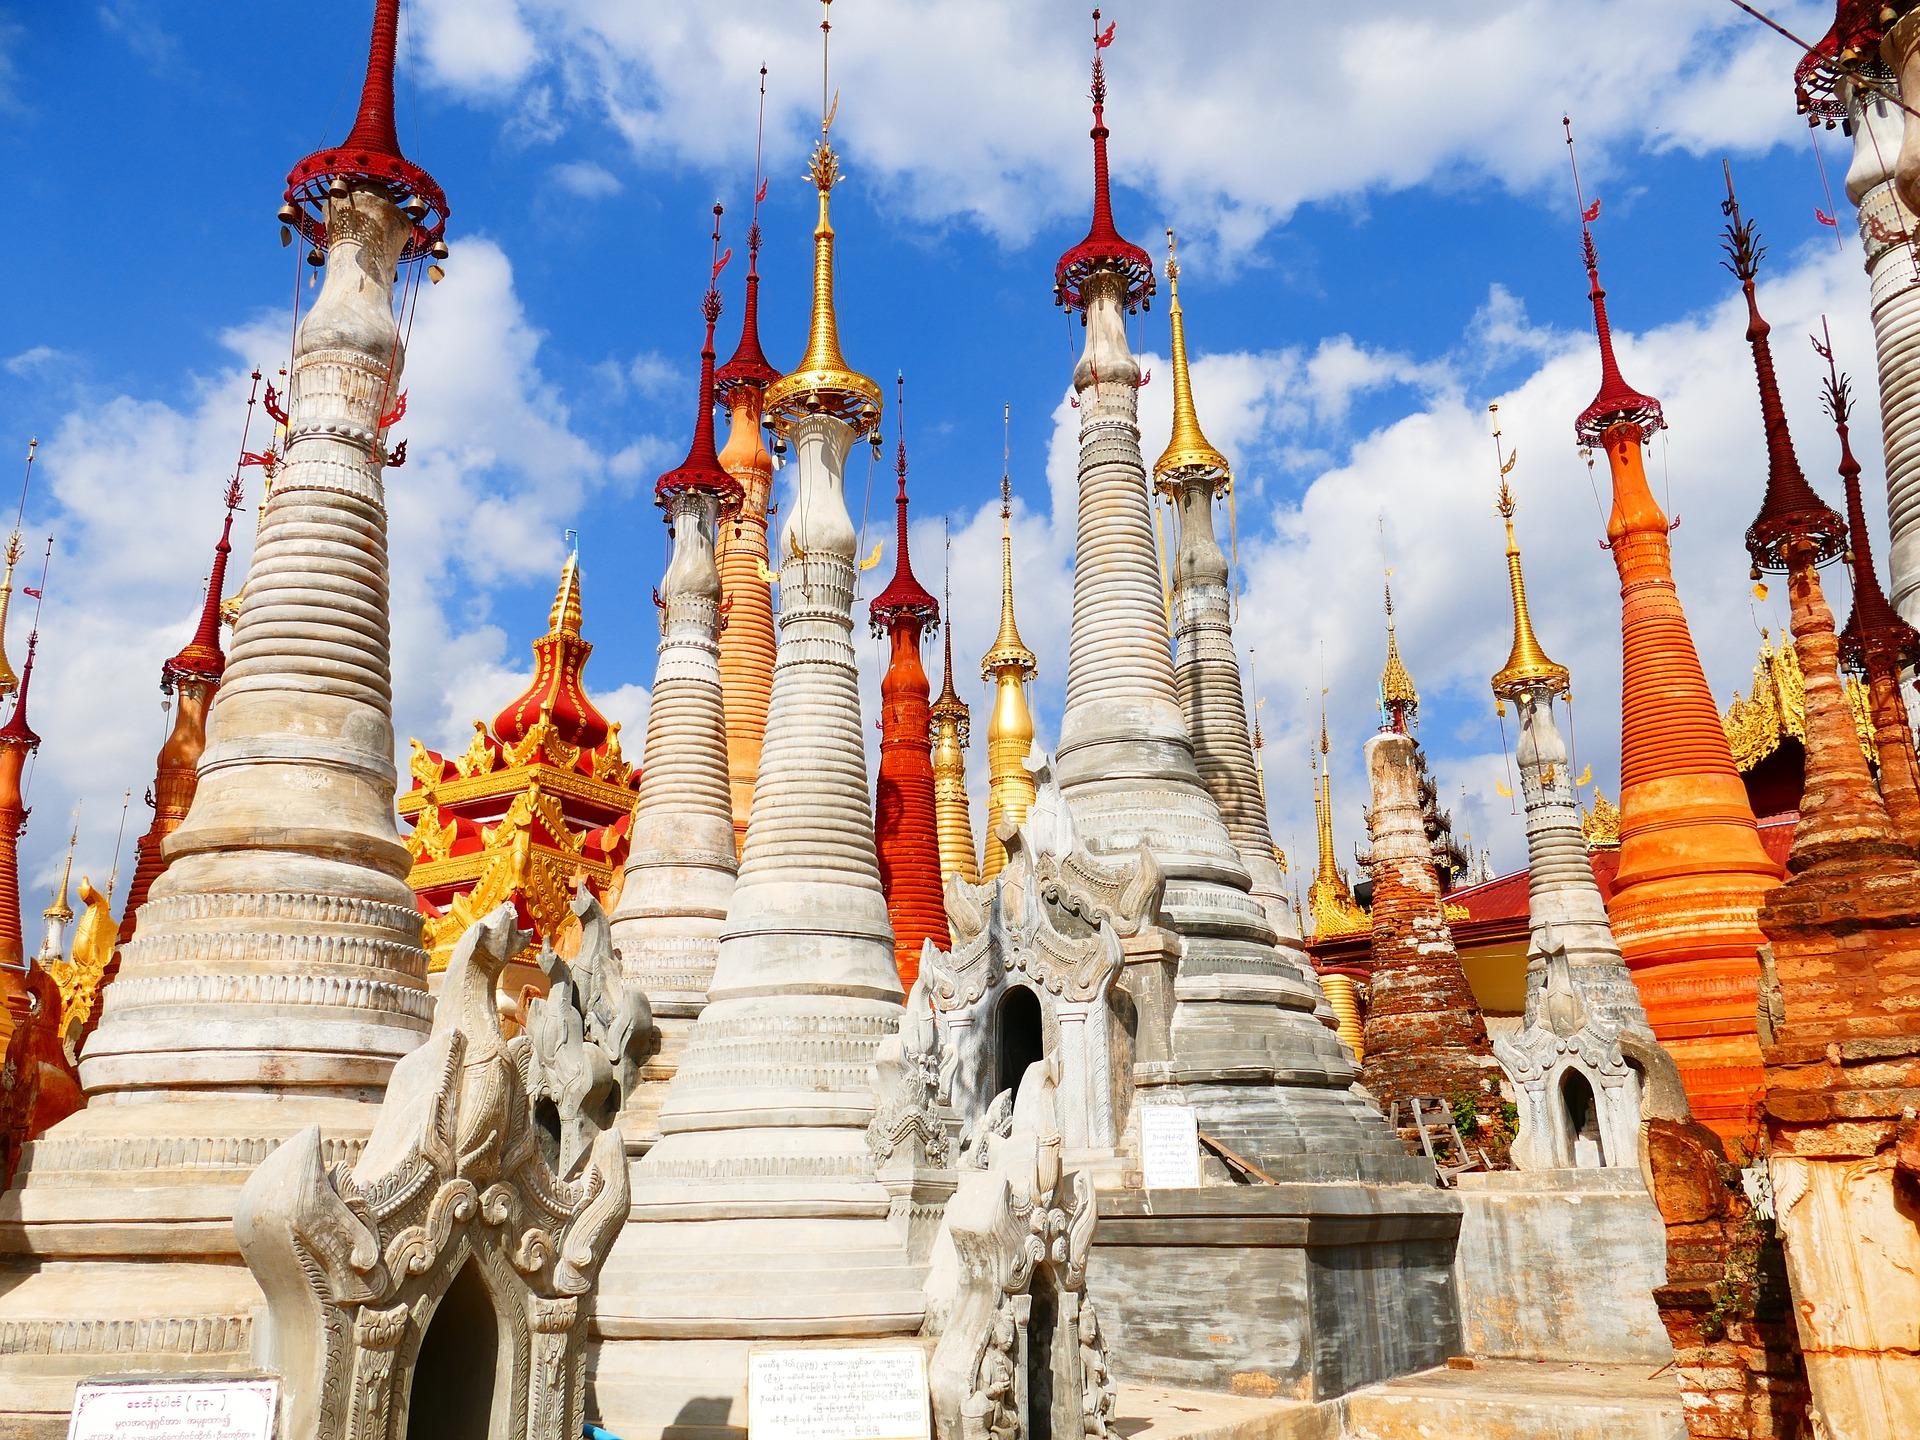 Tempel, Myanmar, Burma, Pagode, Stupa - Wallpaper HD - Prof.-falken.com